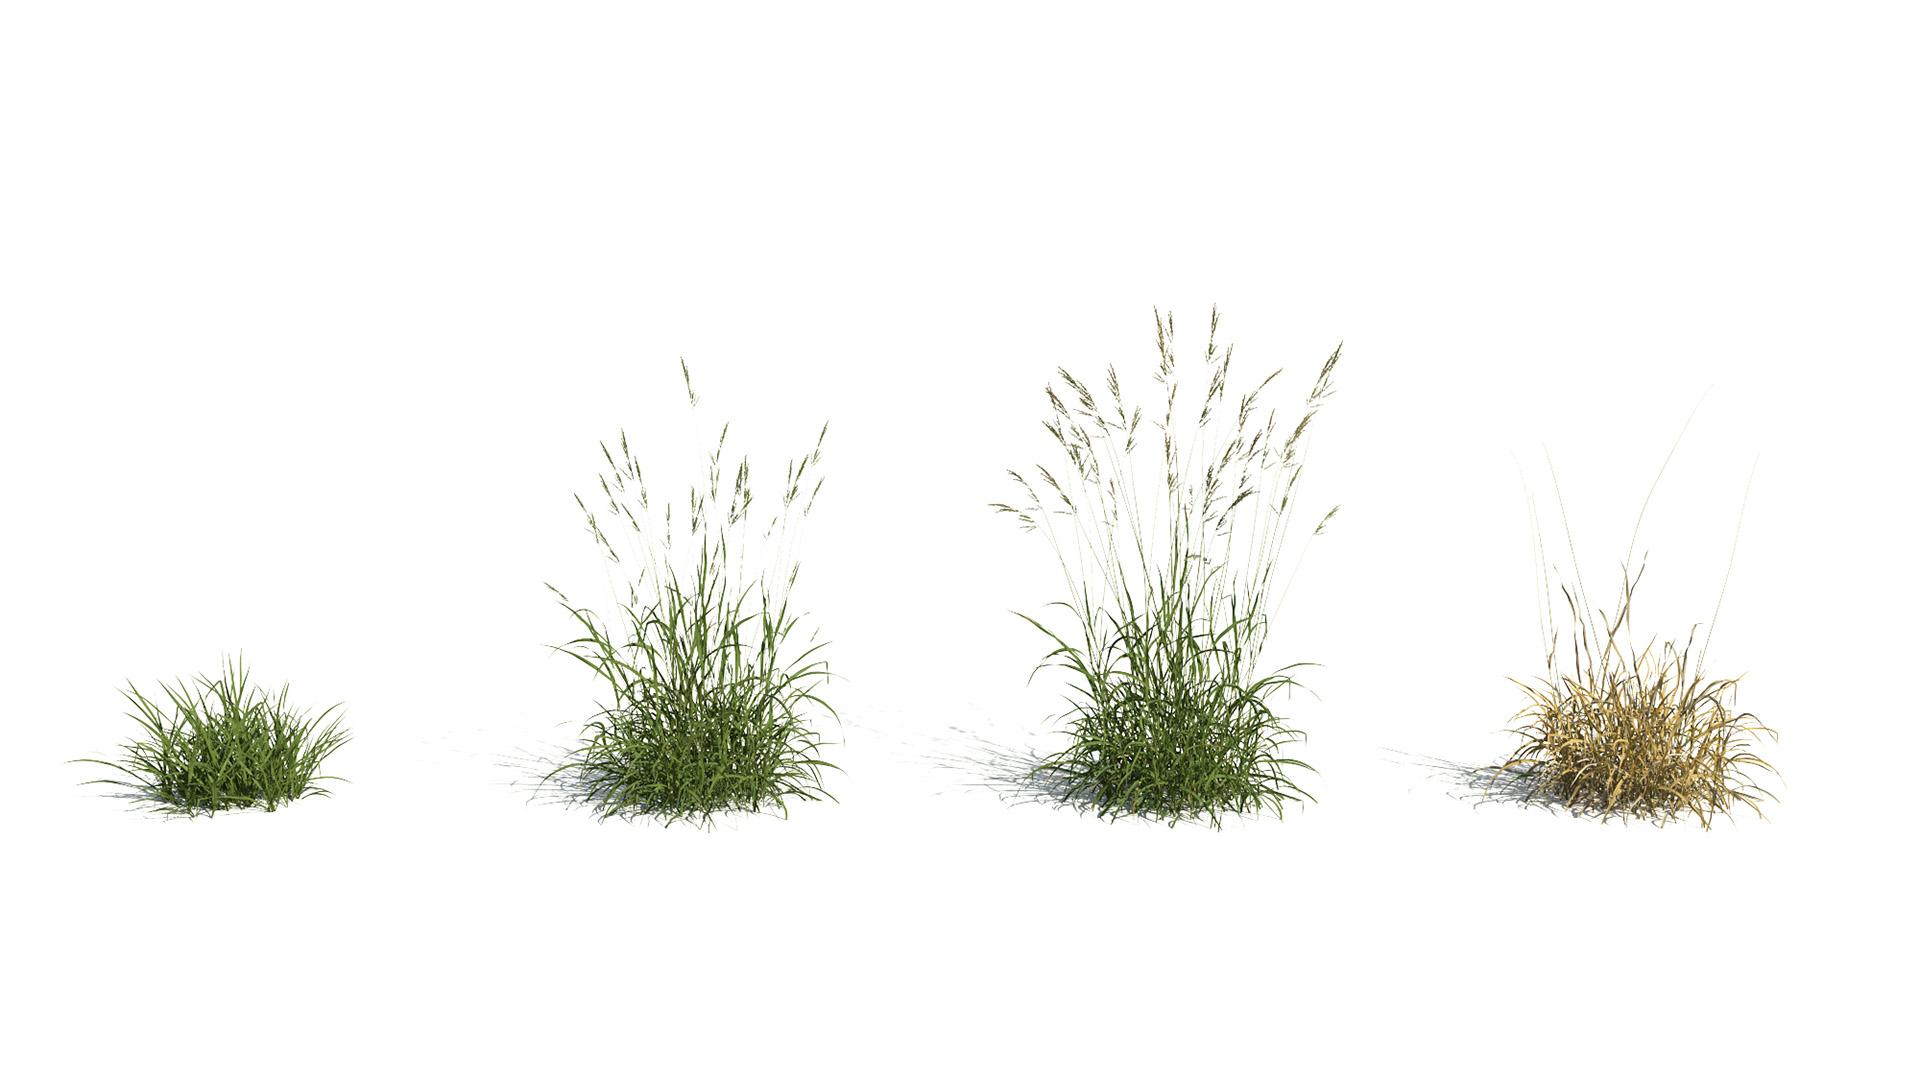 3D model of the Tall fescue Festuca arundinacea season variations